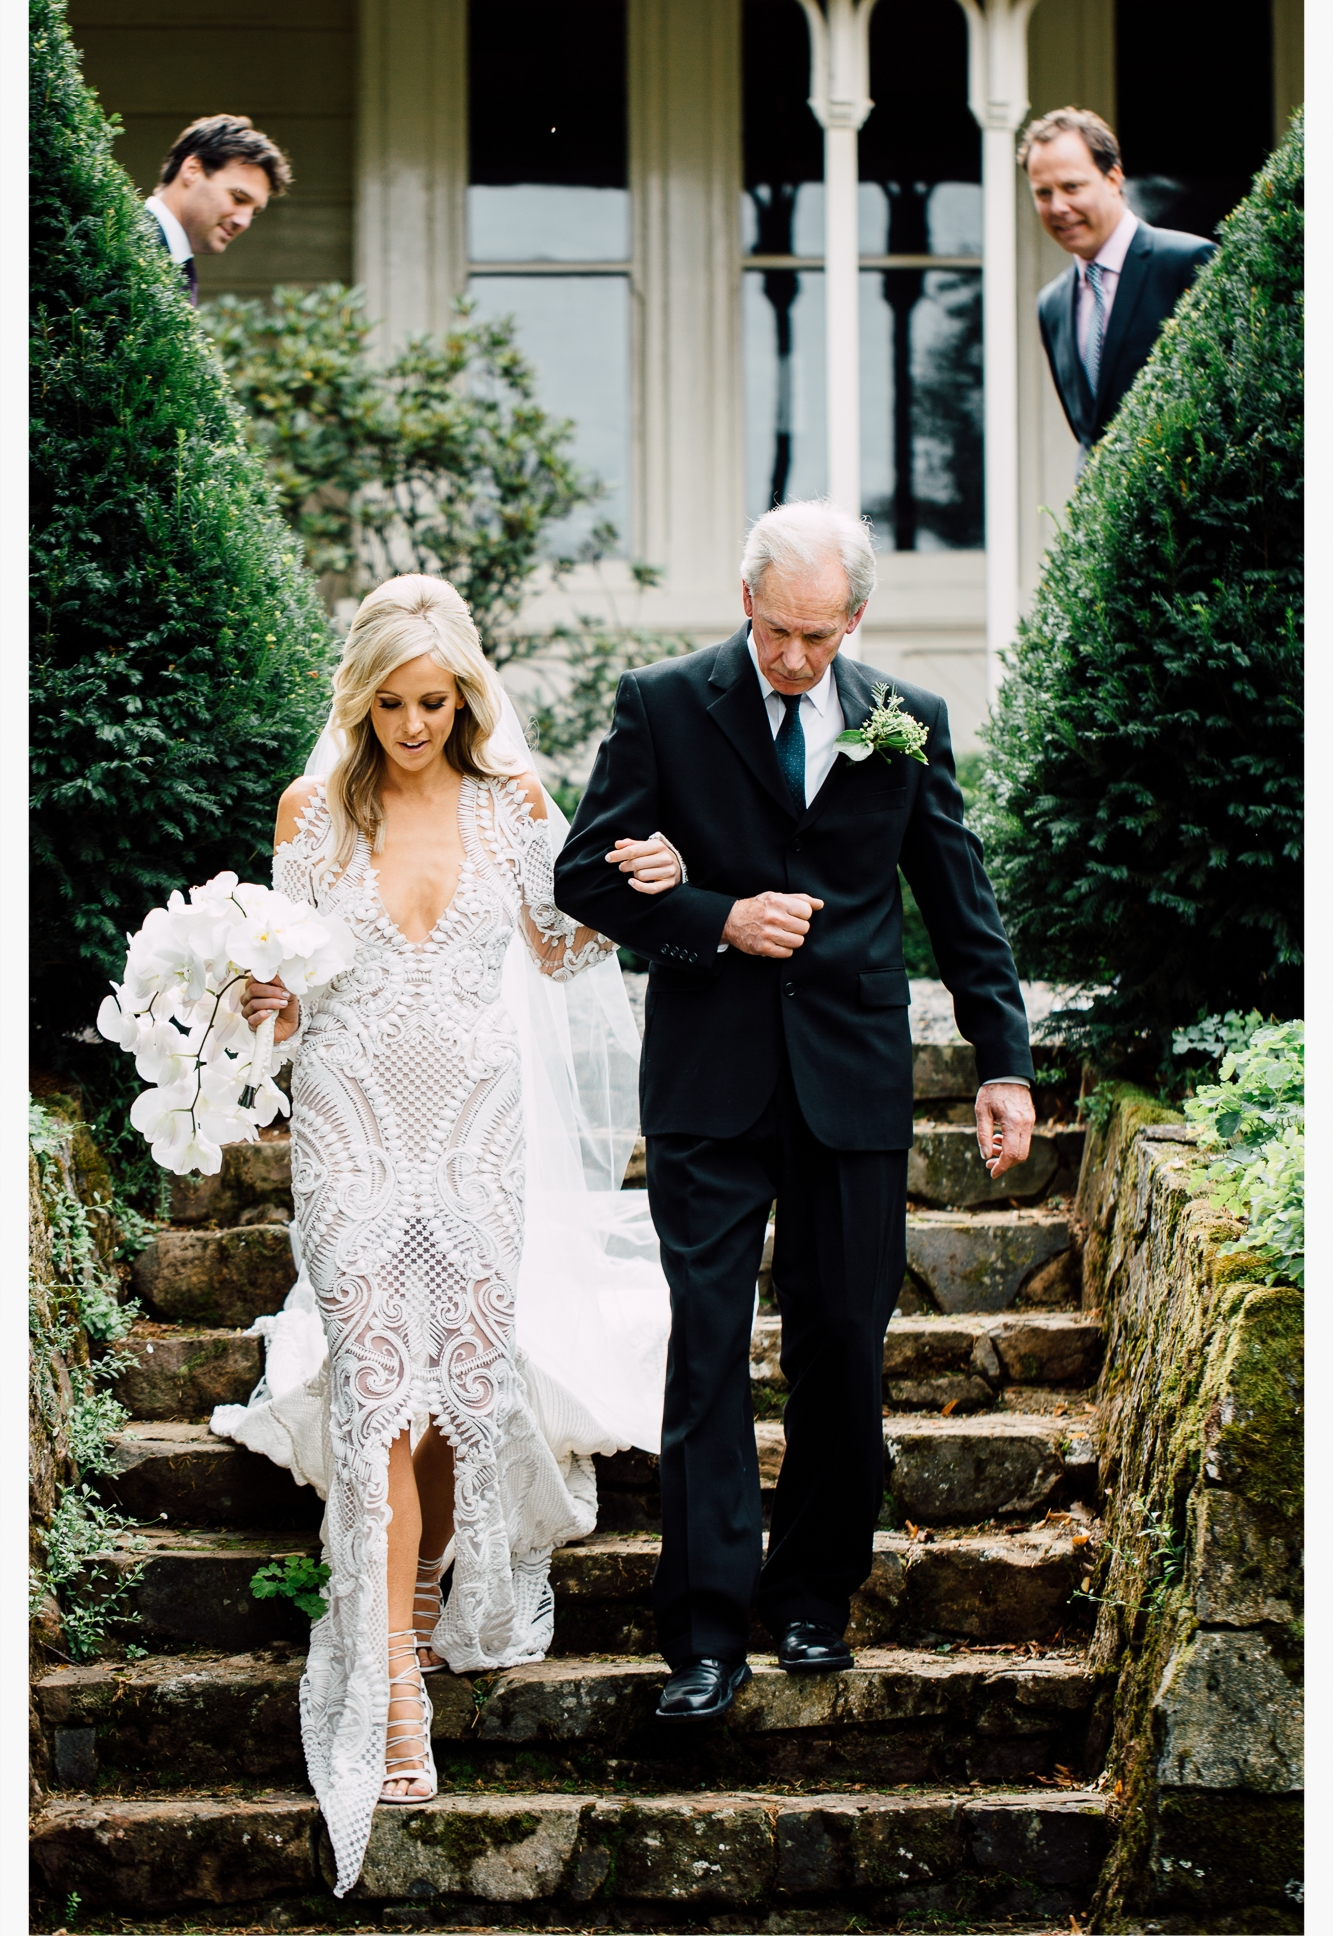 LOVE FIND CO. // LOVE // Helen & Trent